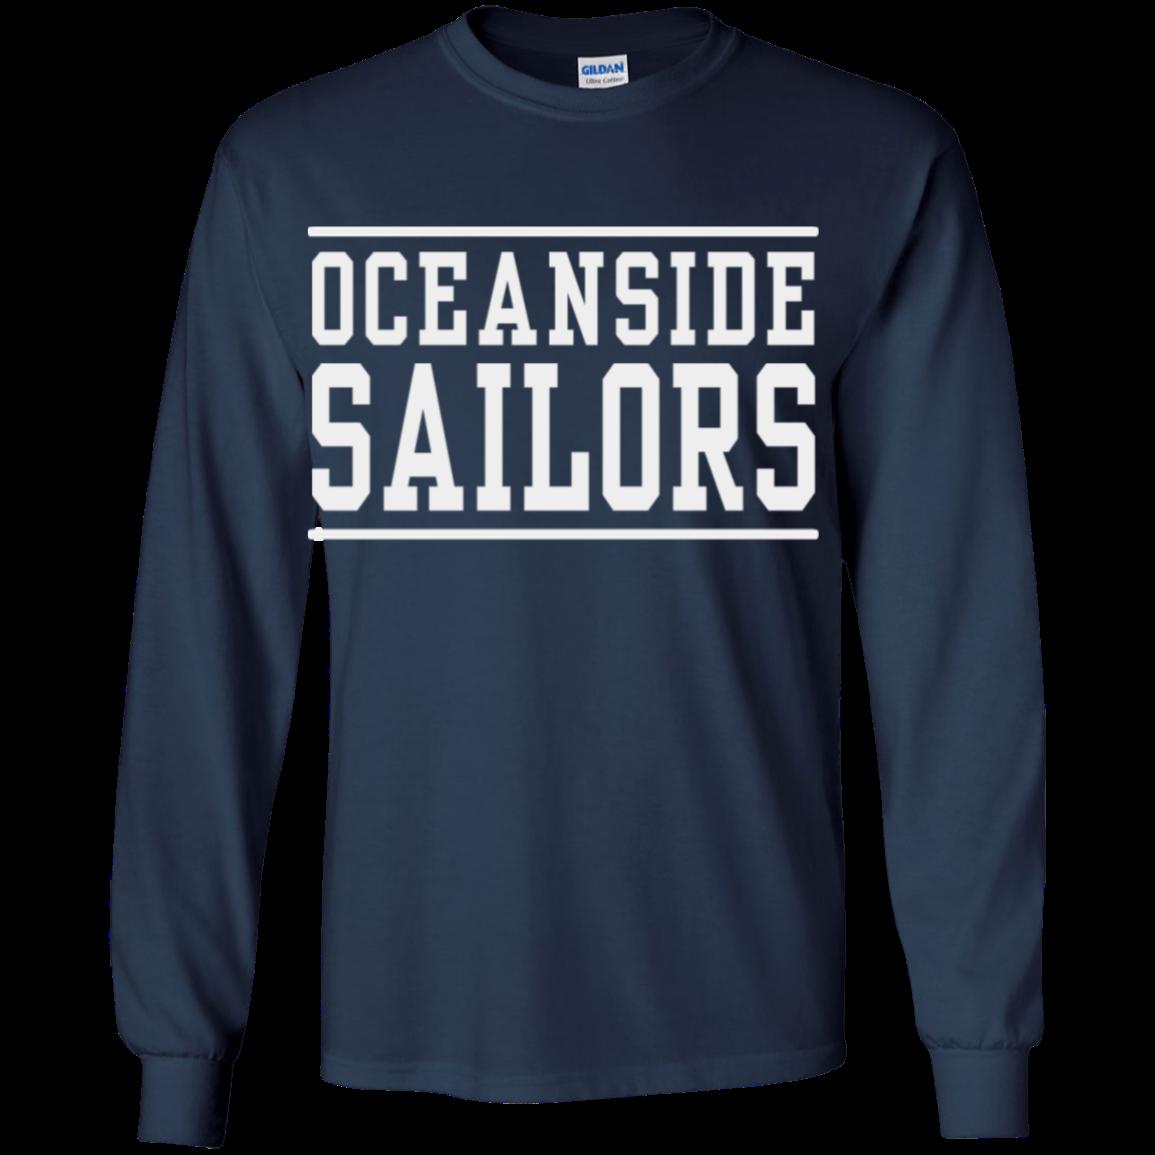 Oceanside High School Youth Long Sleeve Shirt Spiritshopcom